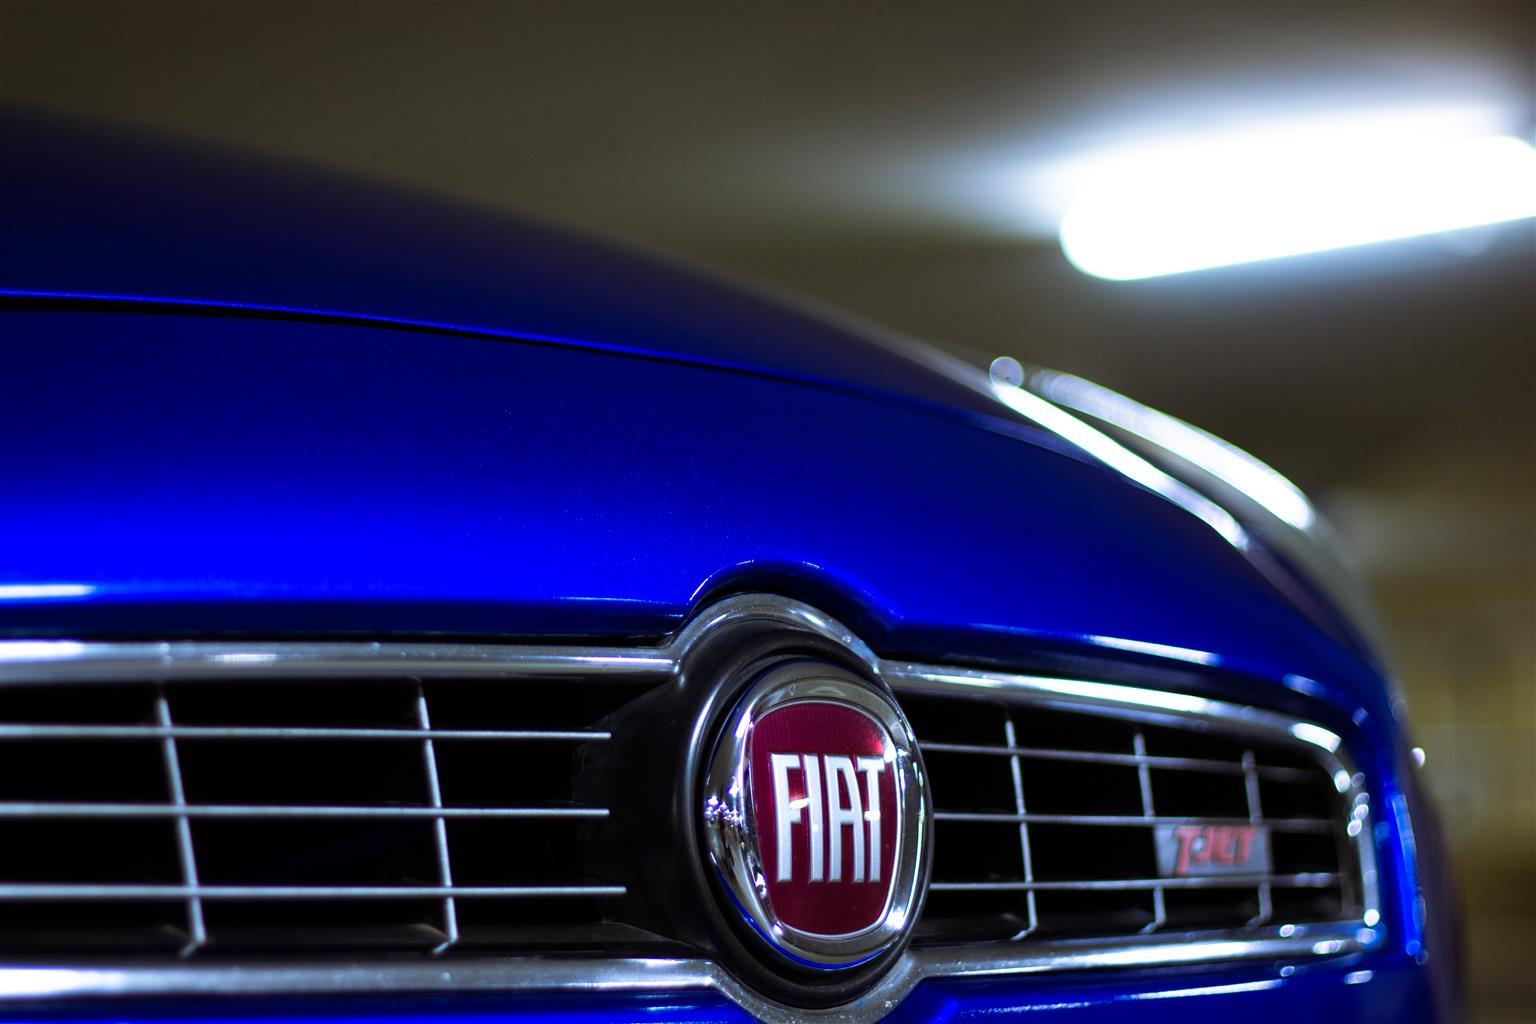 2007 Fiat Bravo 1.4 T Jet Sport